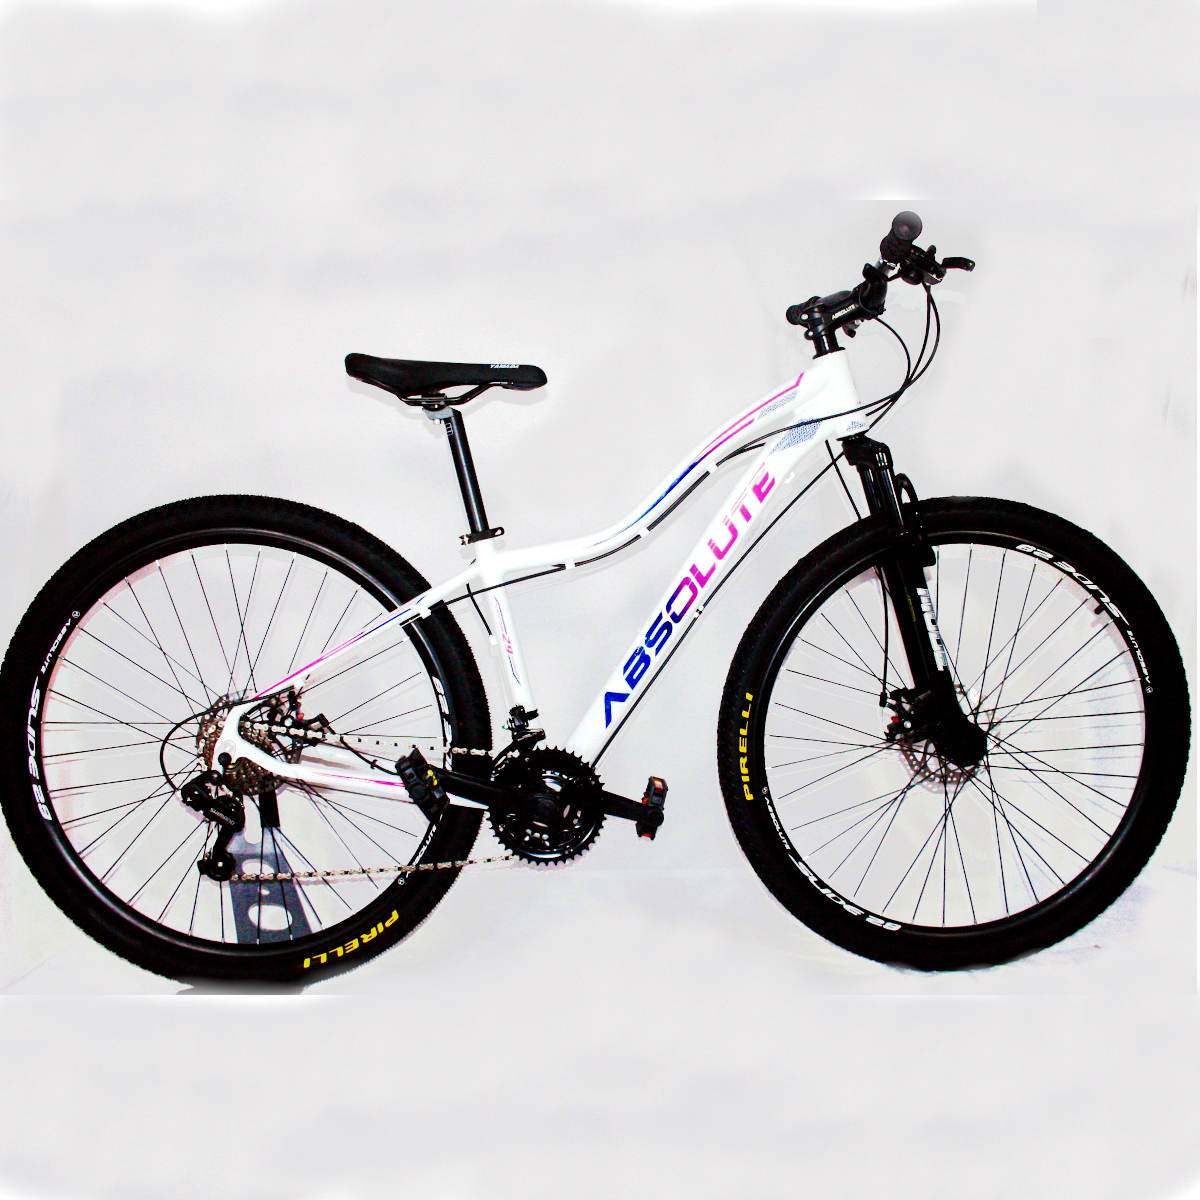 Bicicleta Absolute Hera Aro 29 Feminina  Branco